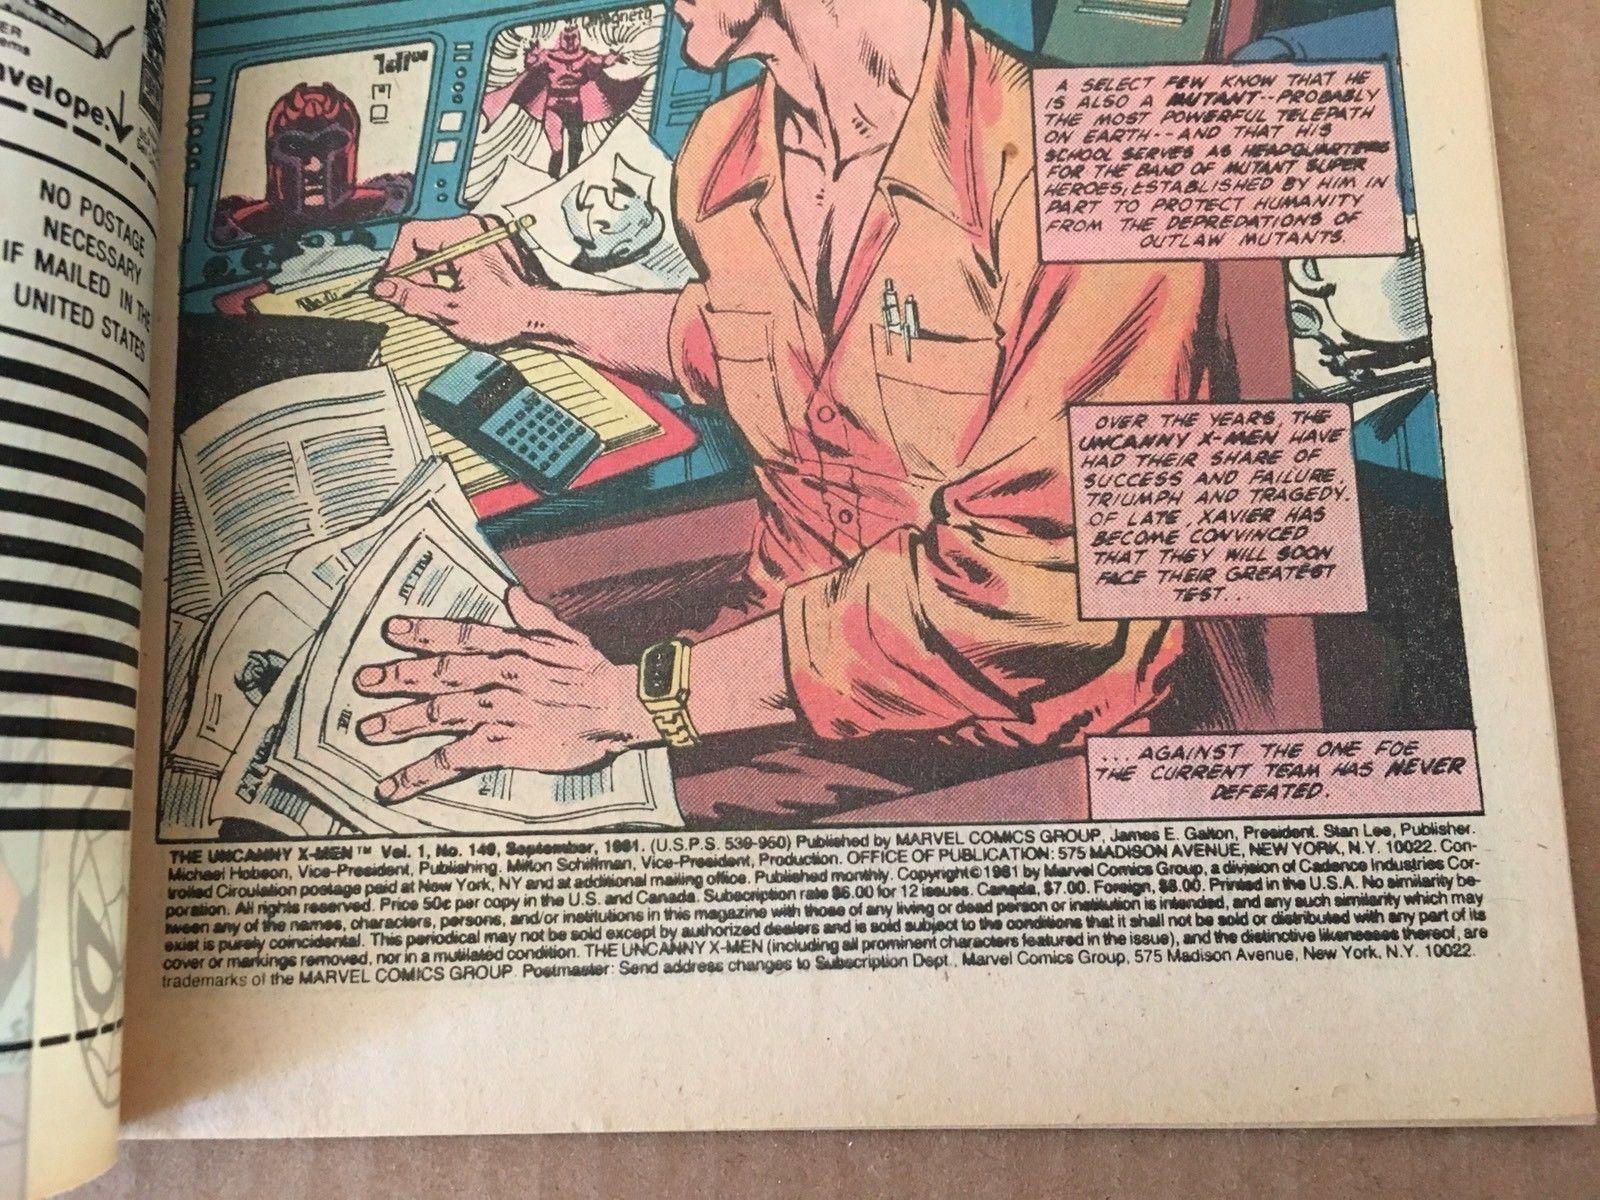 X-Men #149 Marvel Comic Book from 1981 FN+ Condition Uncanny X-Men